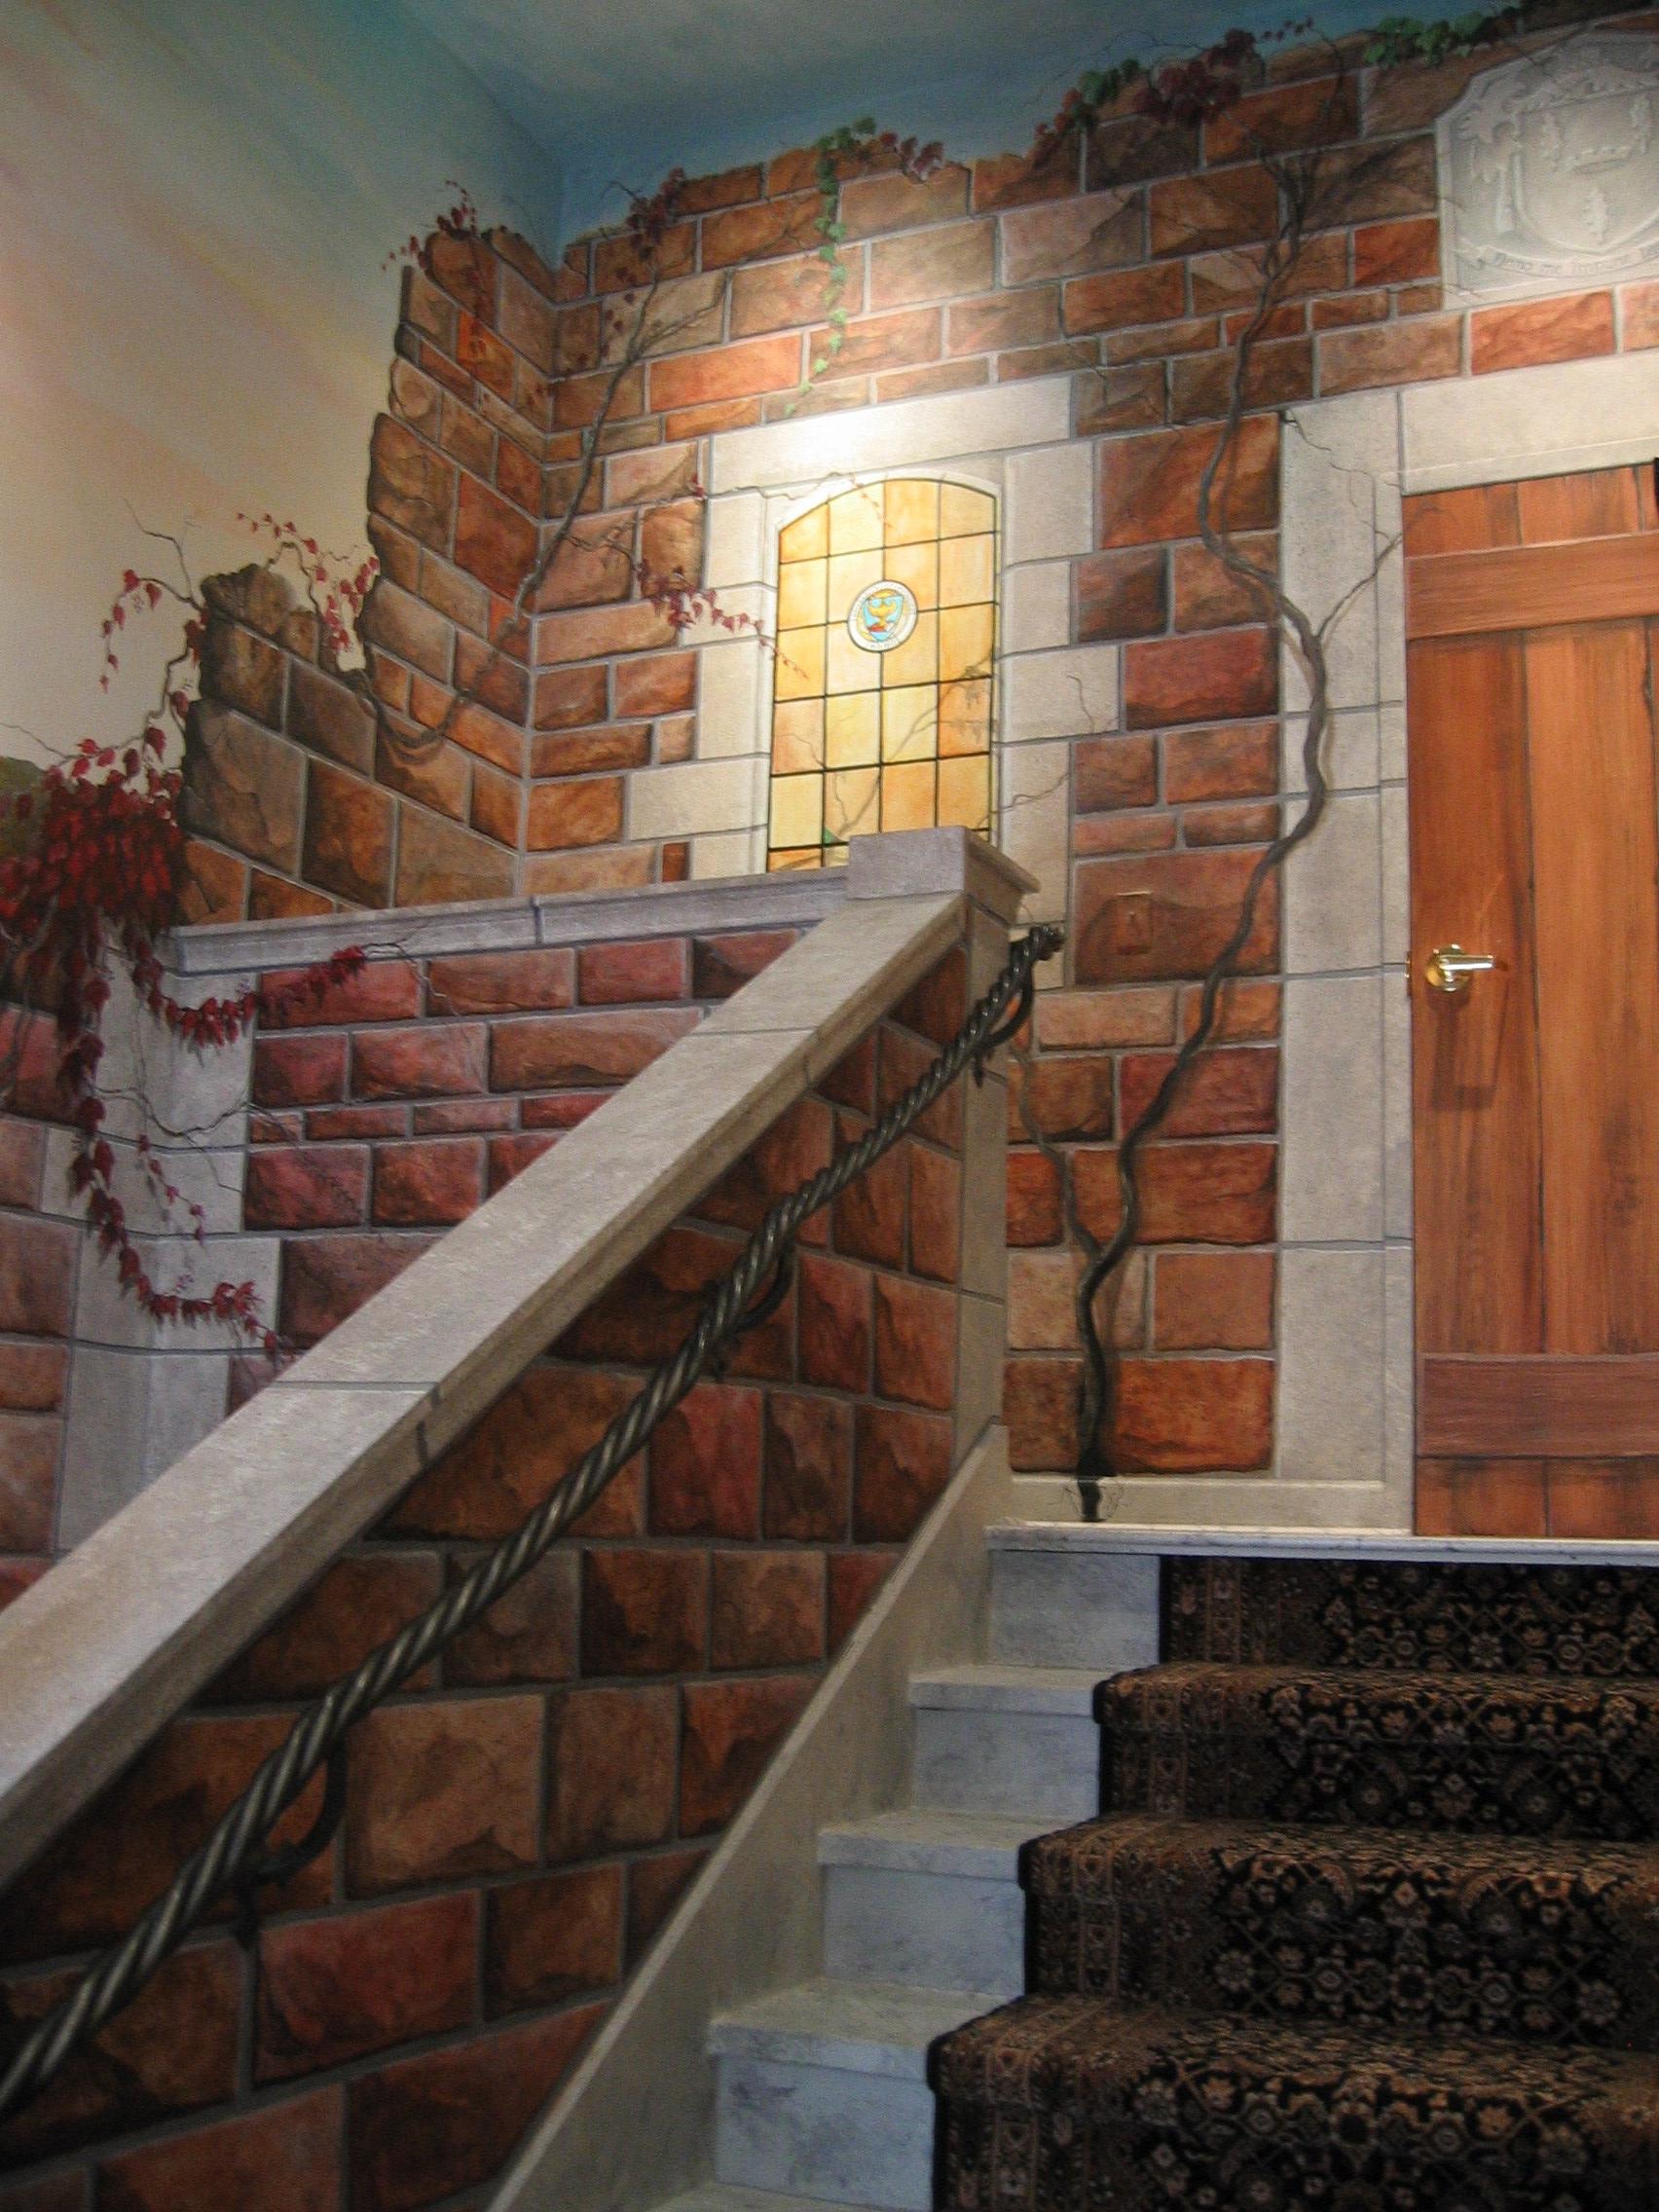 Looking-up-staircase.jpg